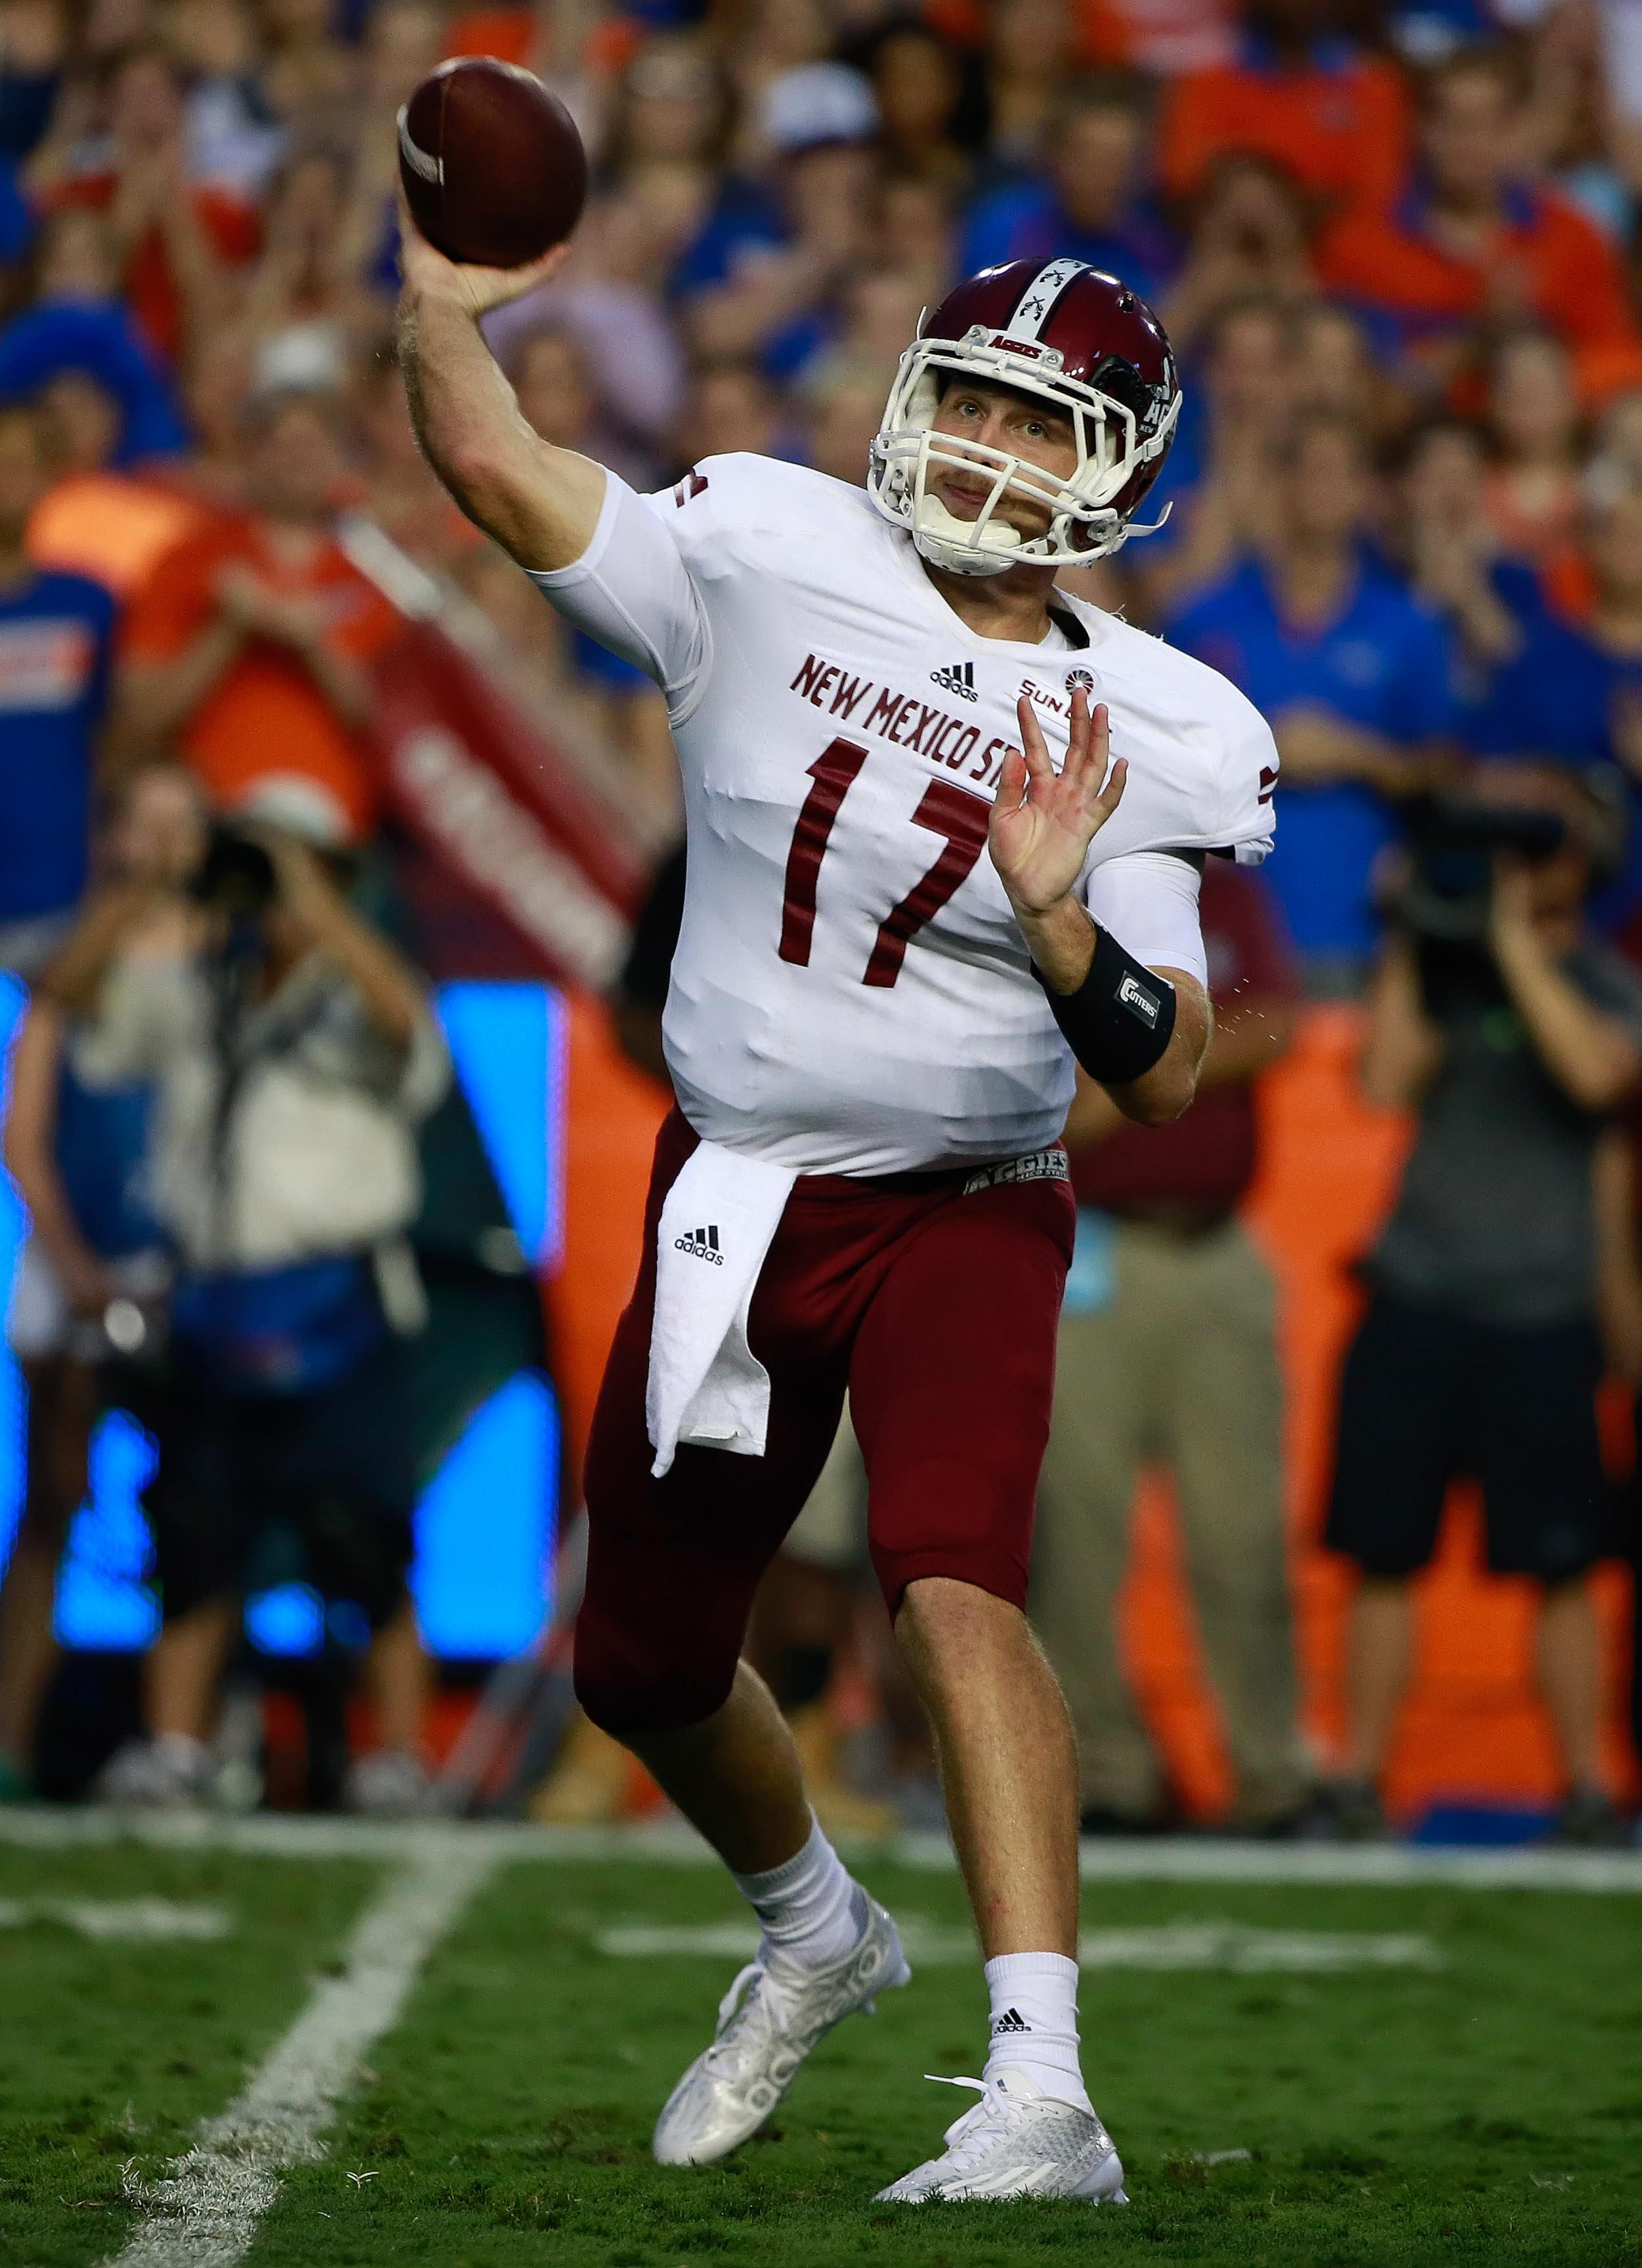 NCAA Football: New Mexico State at Florida